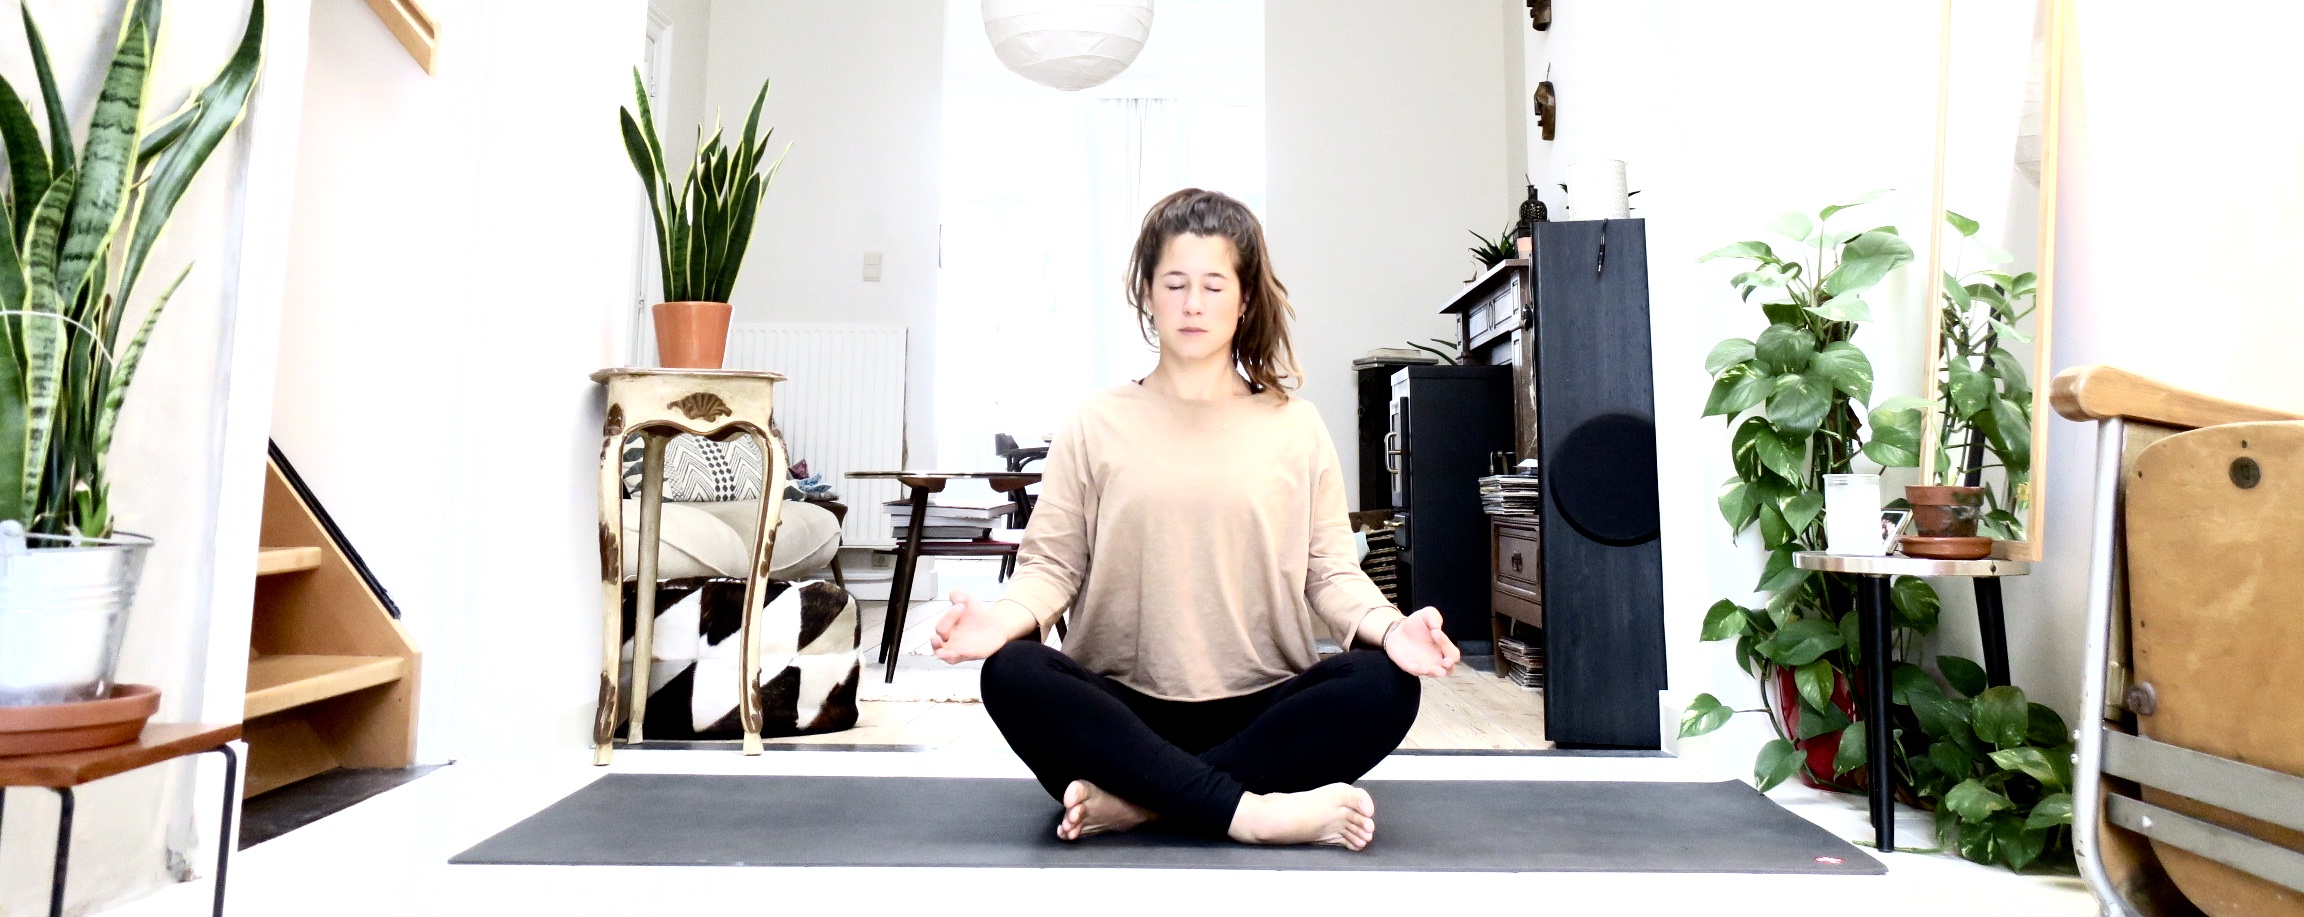 Online yoga * wake up yoga met een gevoelige lage rug